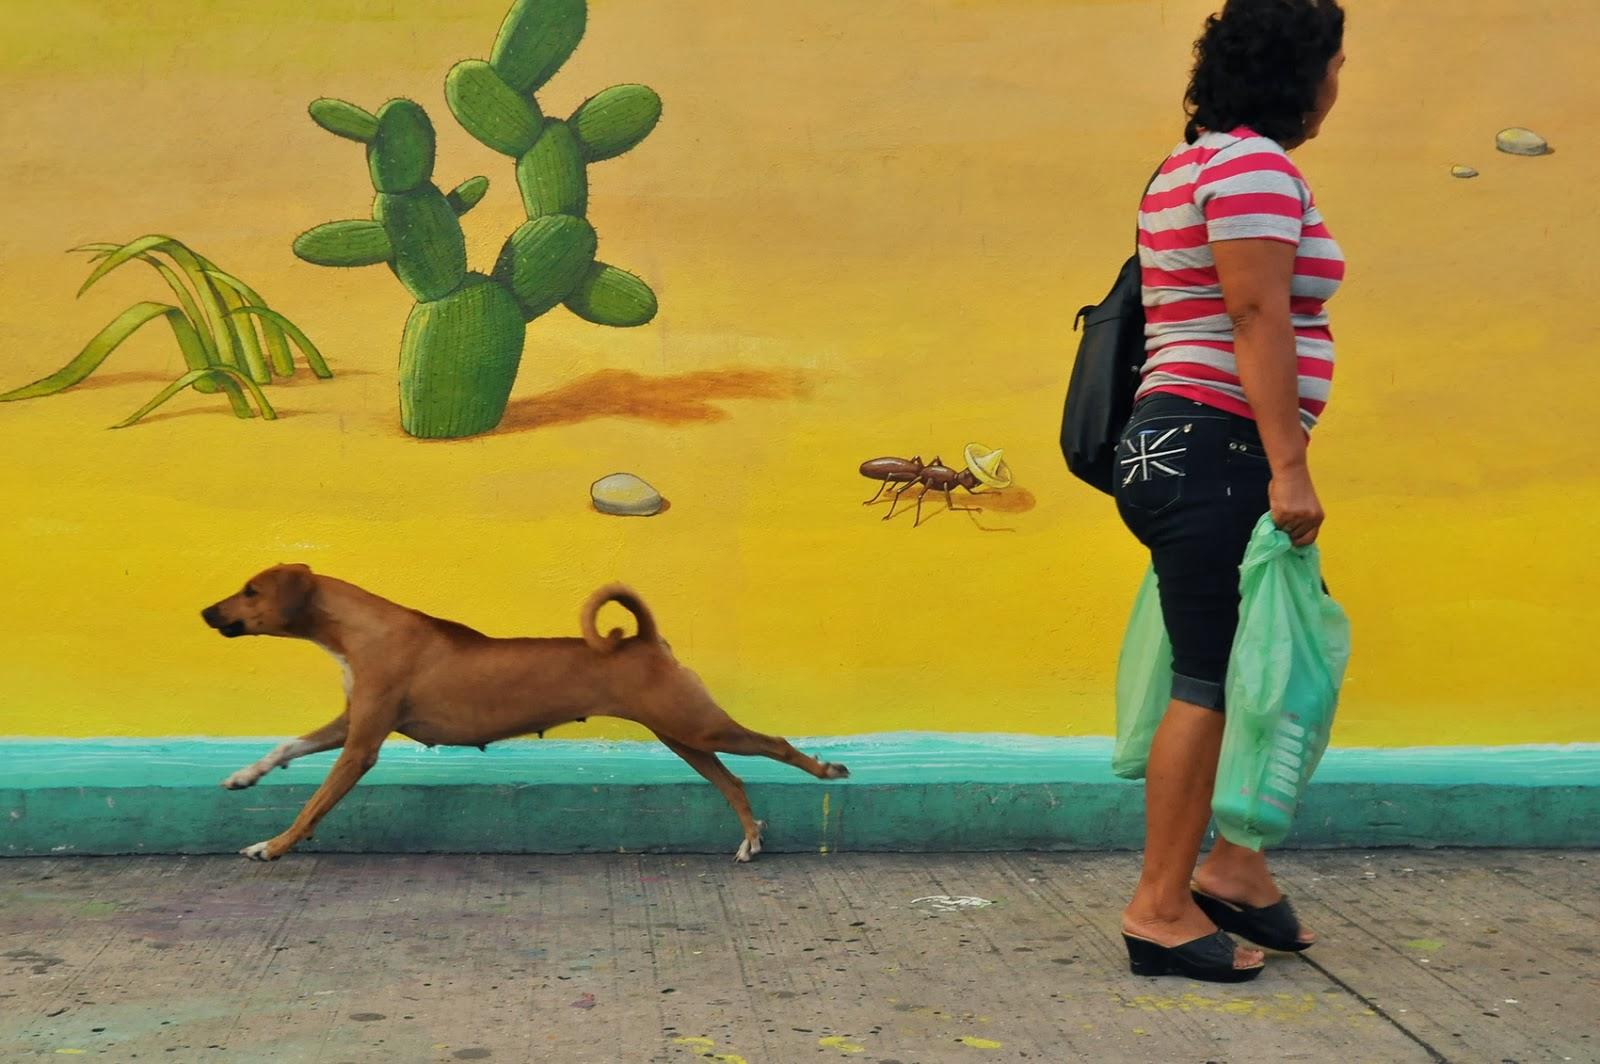 interesni-kazki-new-mural-campeche-mexico-19